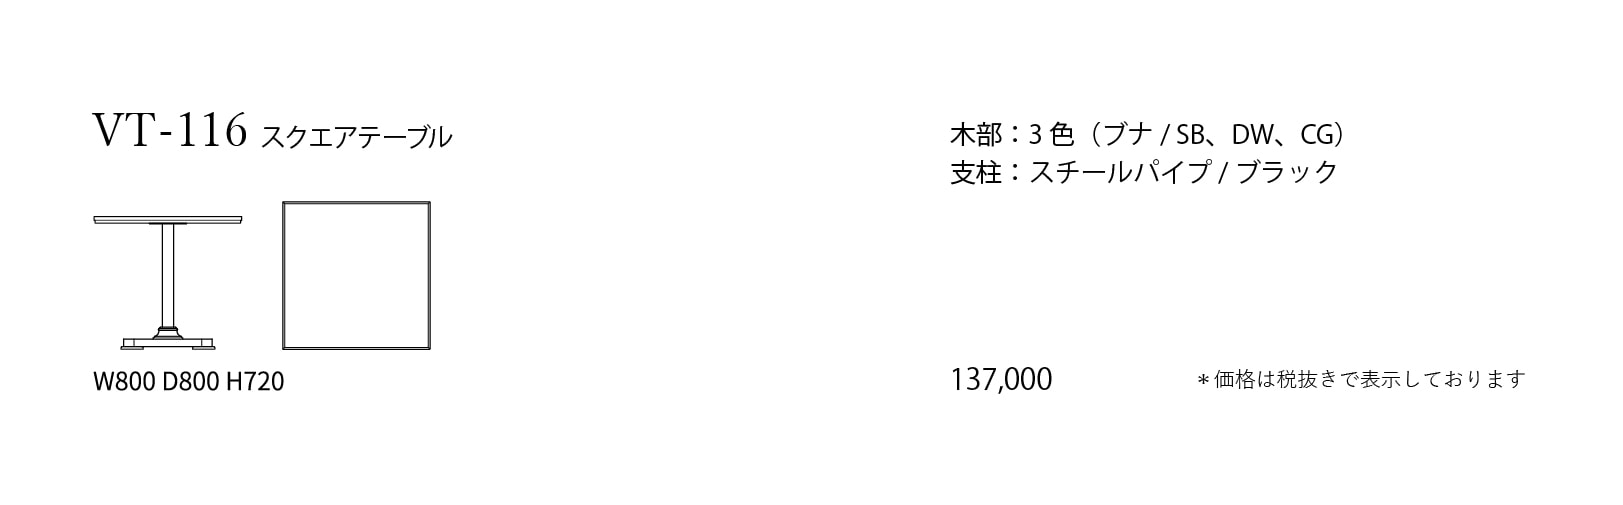 VT-116 Price List